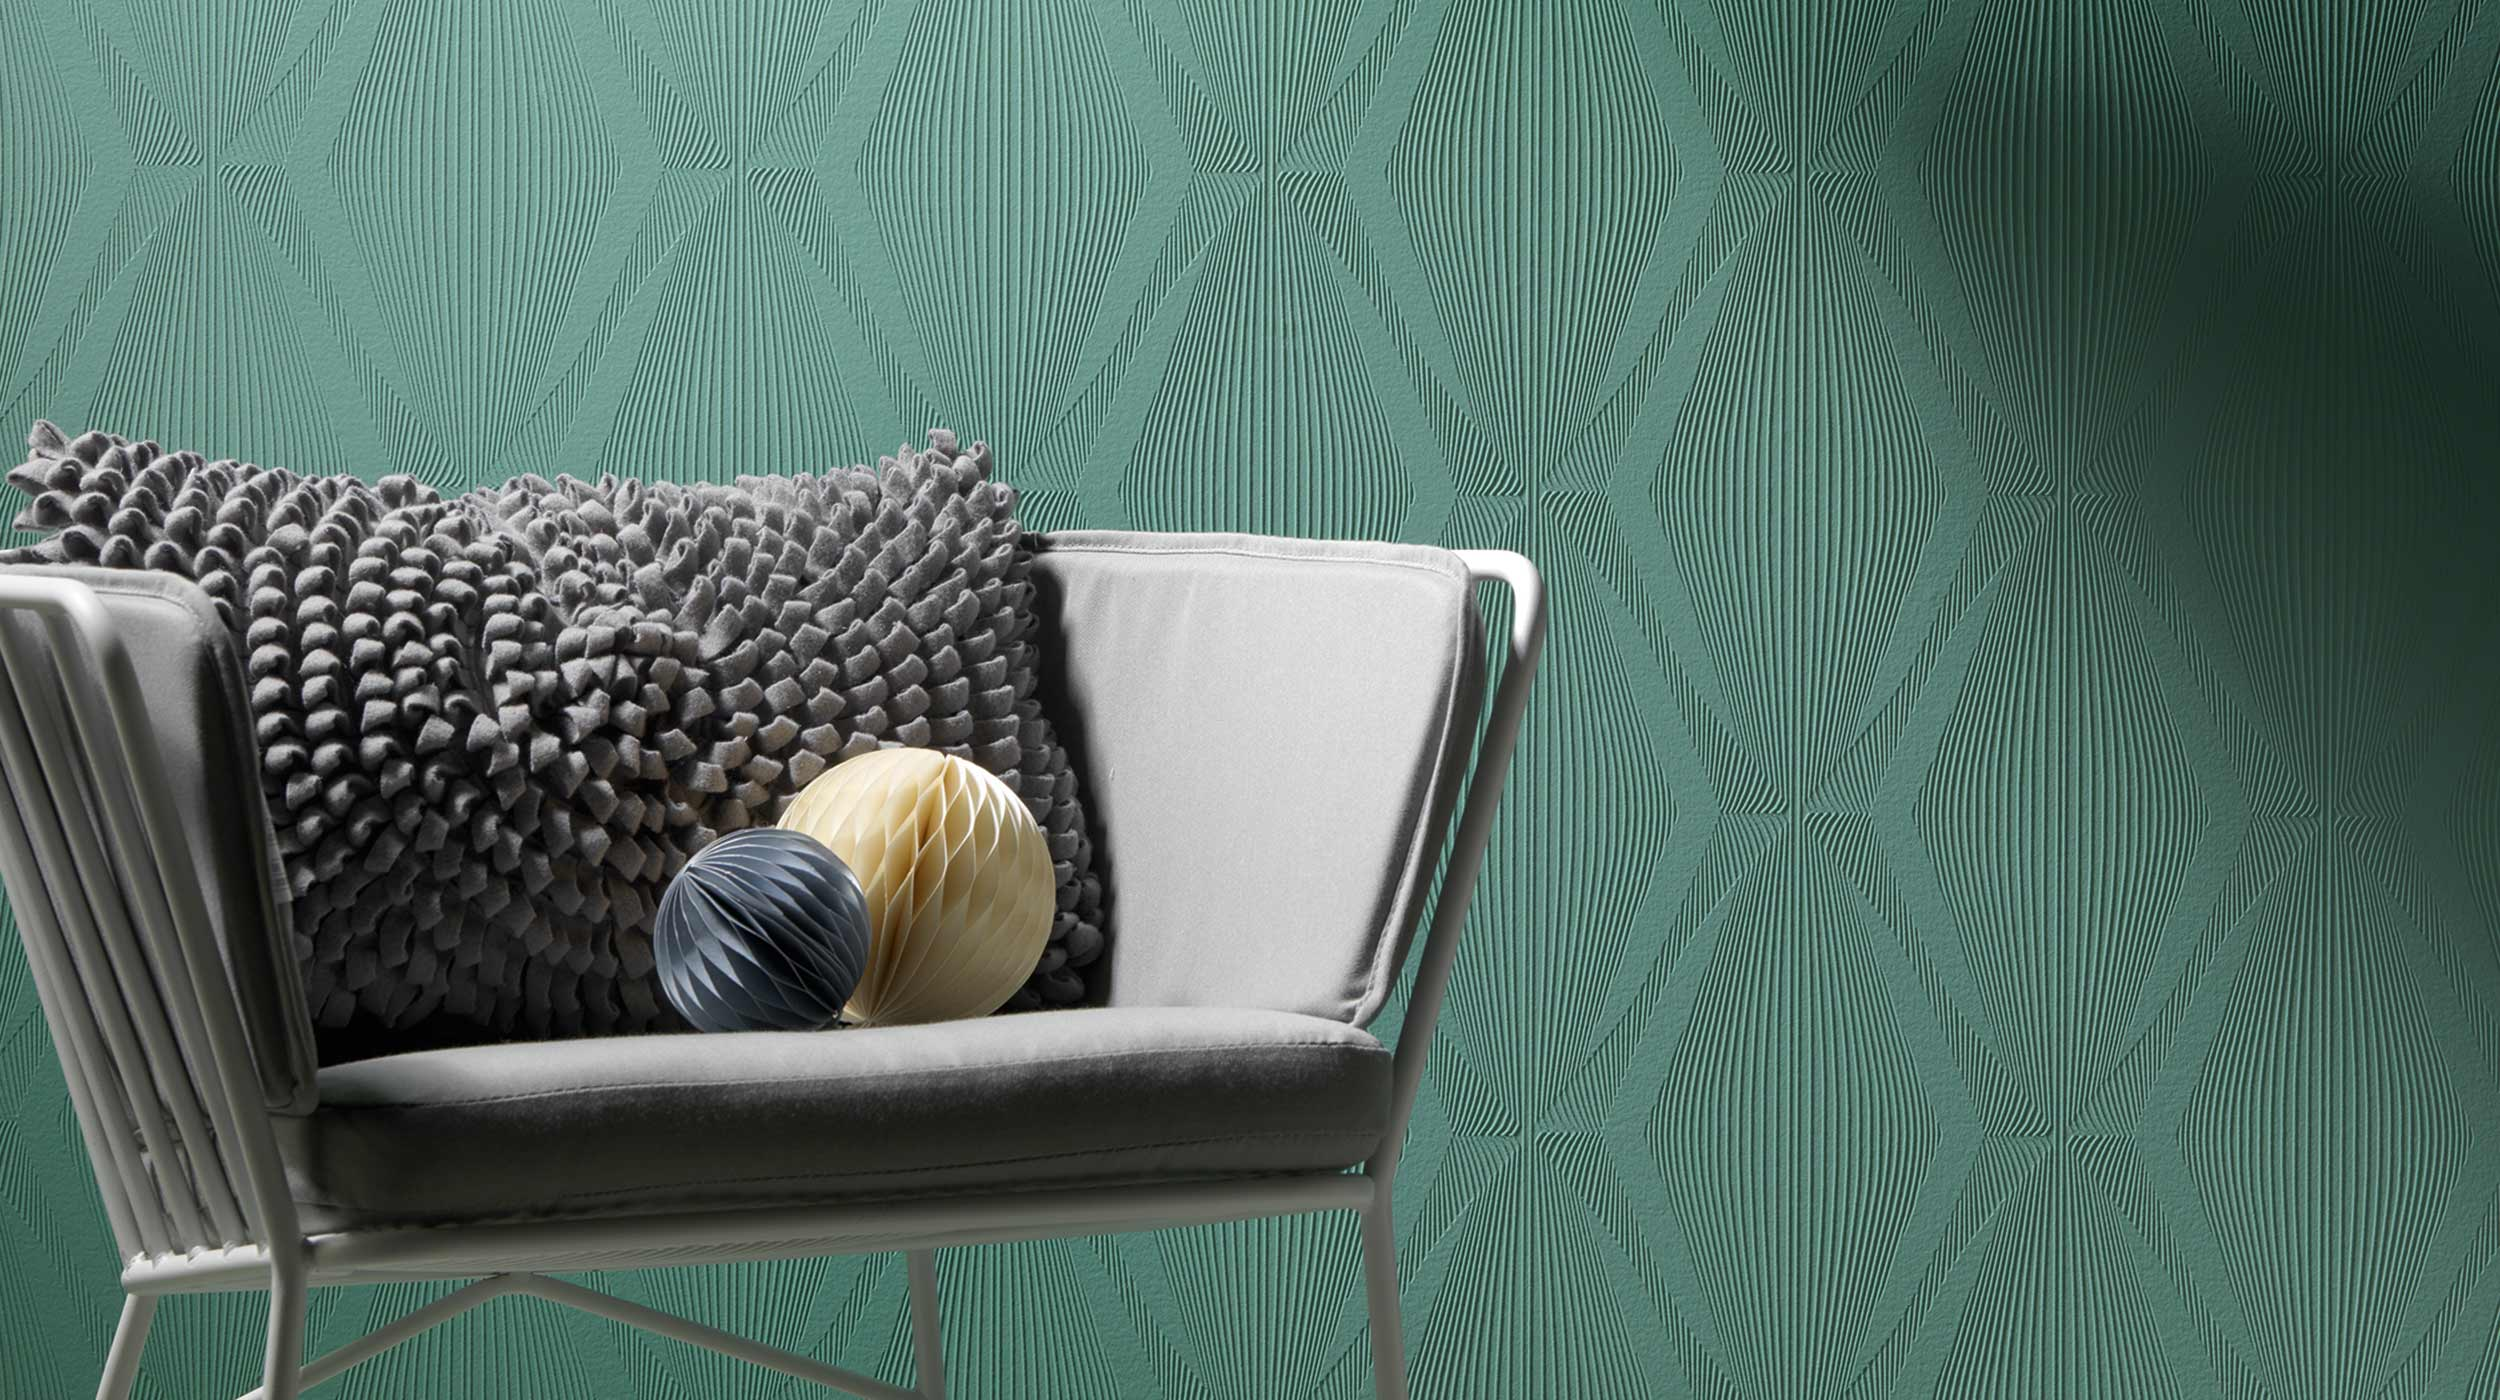 vlies tapeten rollover erismann 14 jpg erismann cie. Black Bedroom Furniture Sets. Home Design Ideas